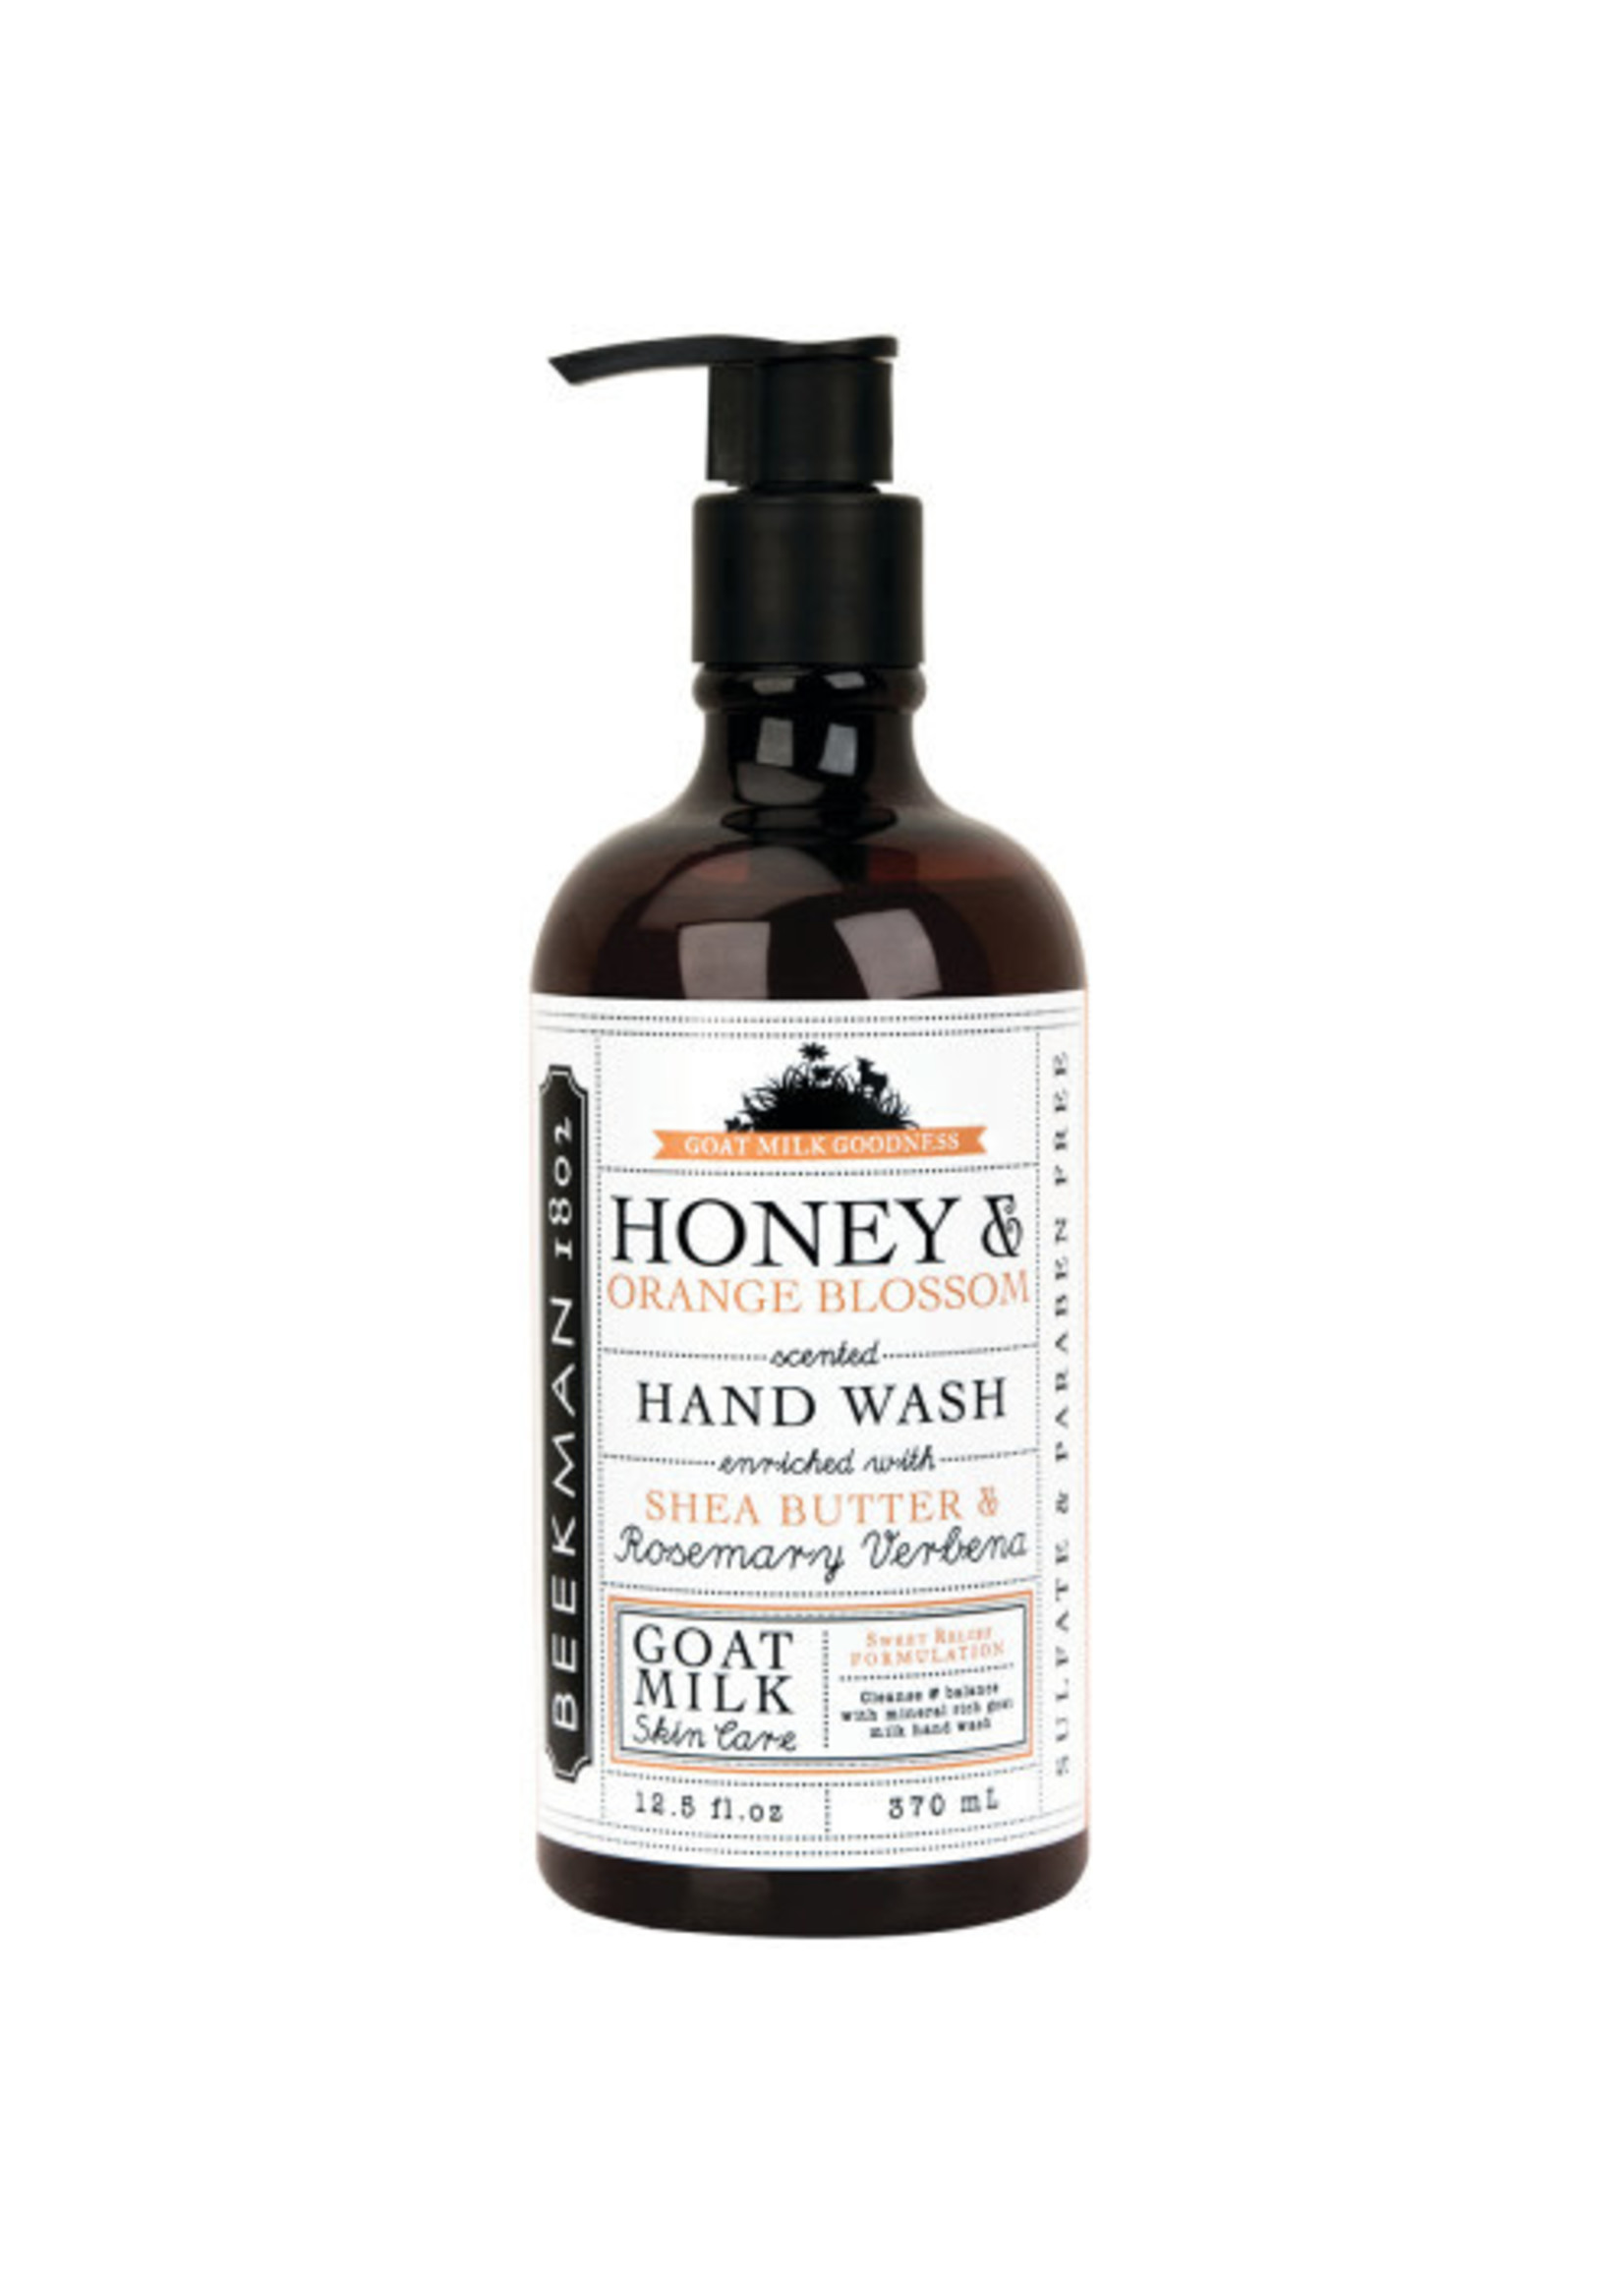 Honey & Orange Blossom Hand & Body Wash